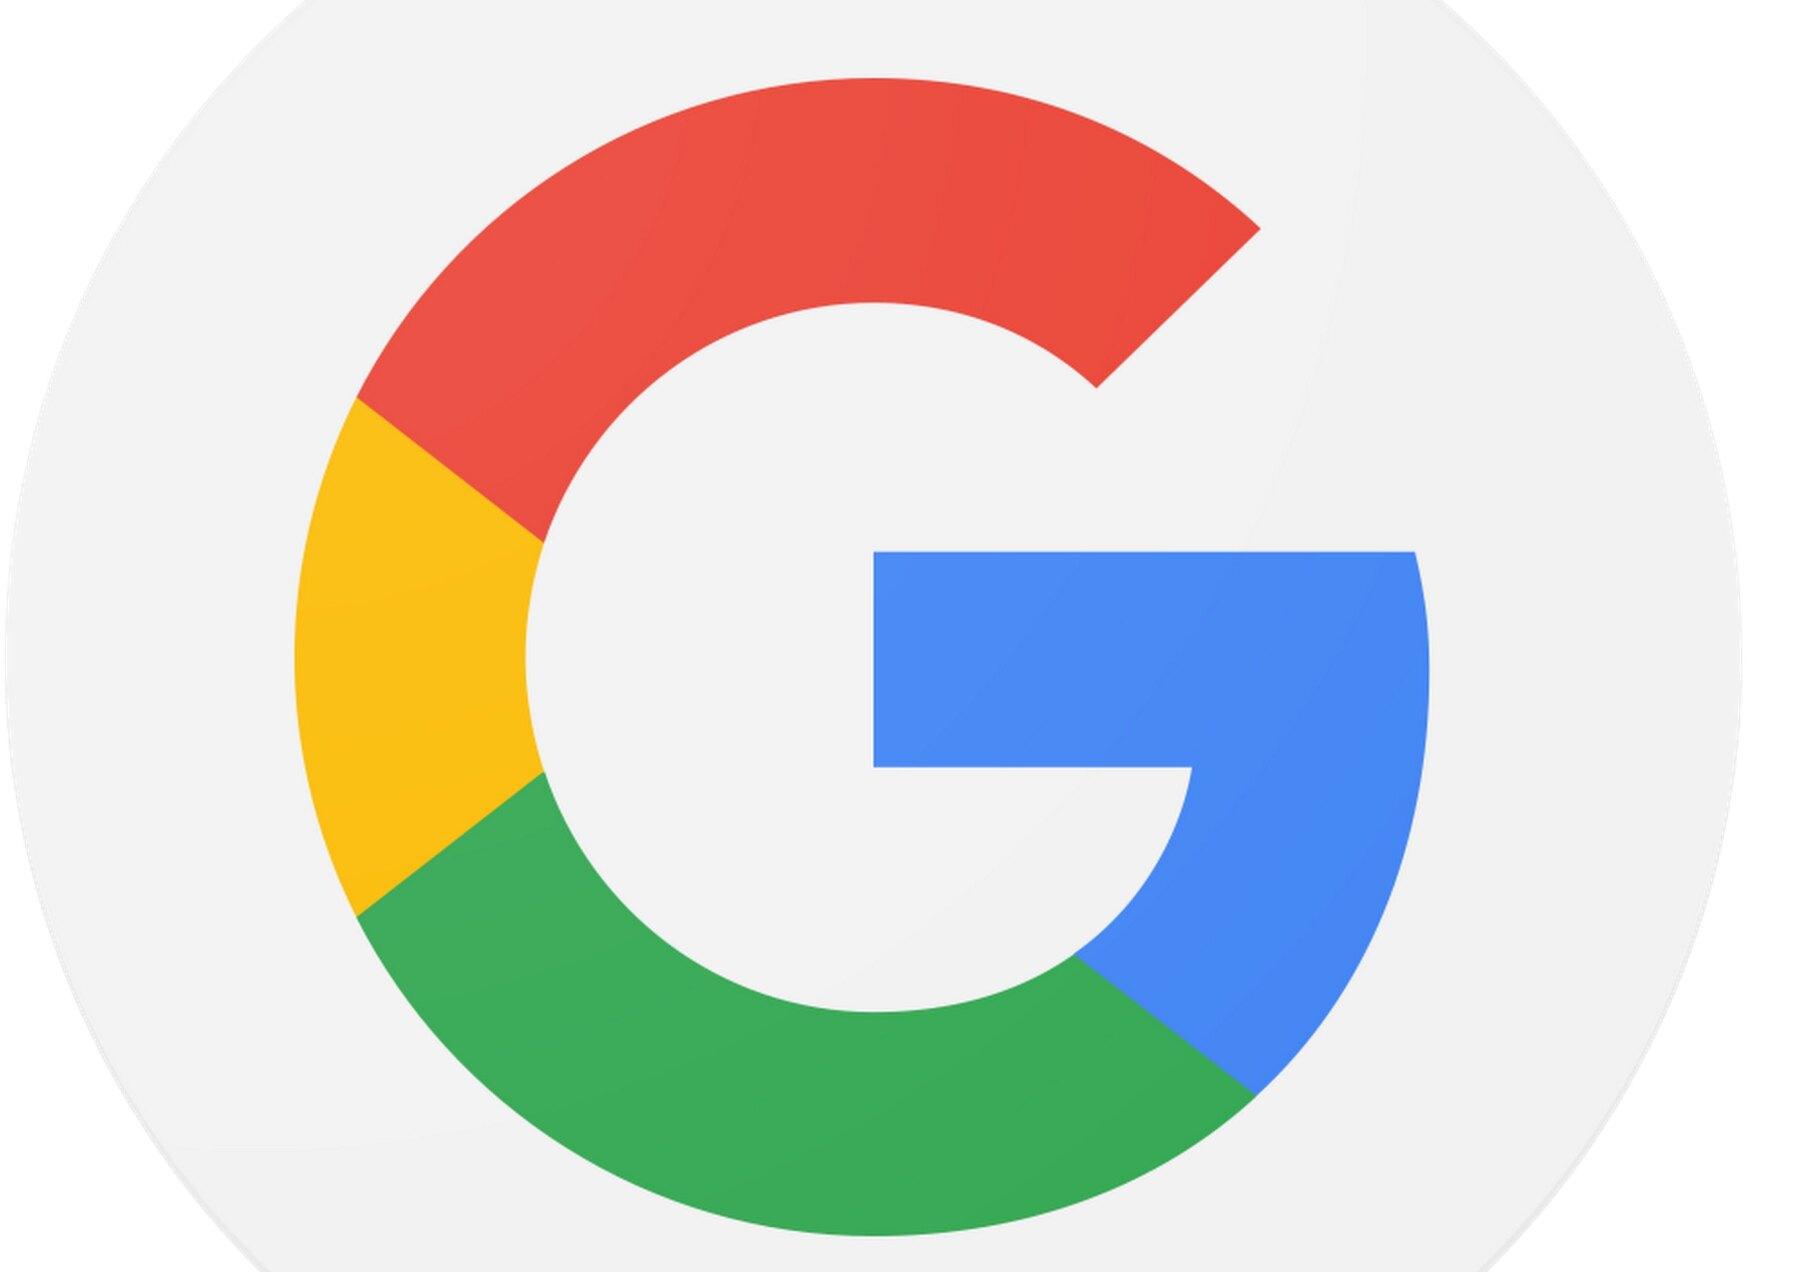 Search_GSA.max-2800x2800.jpg